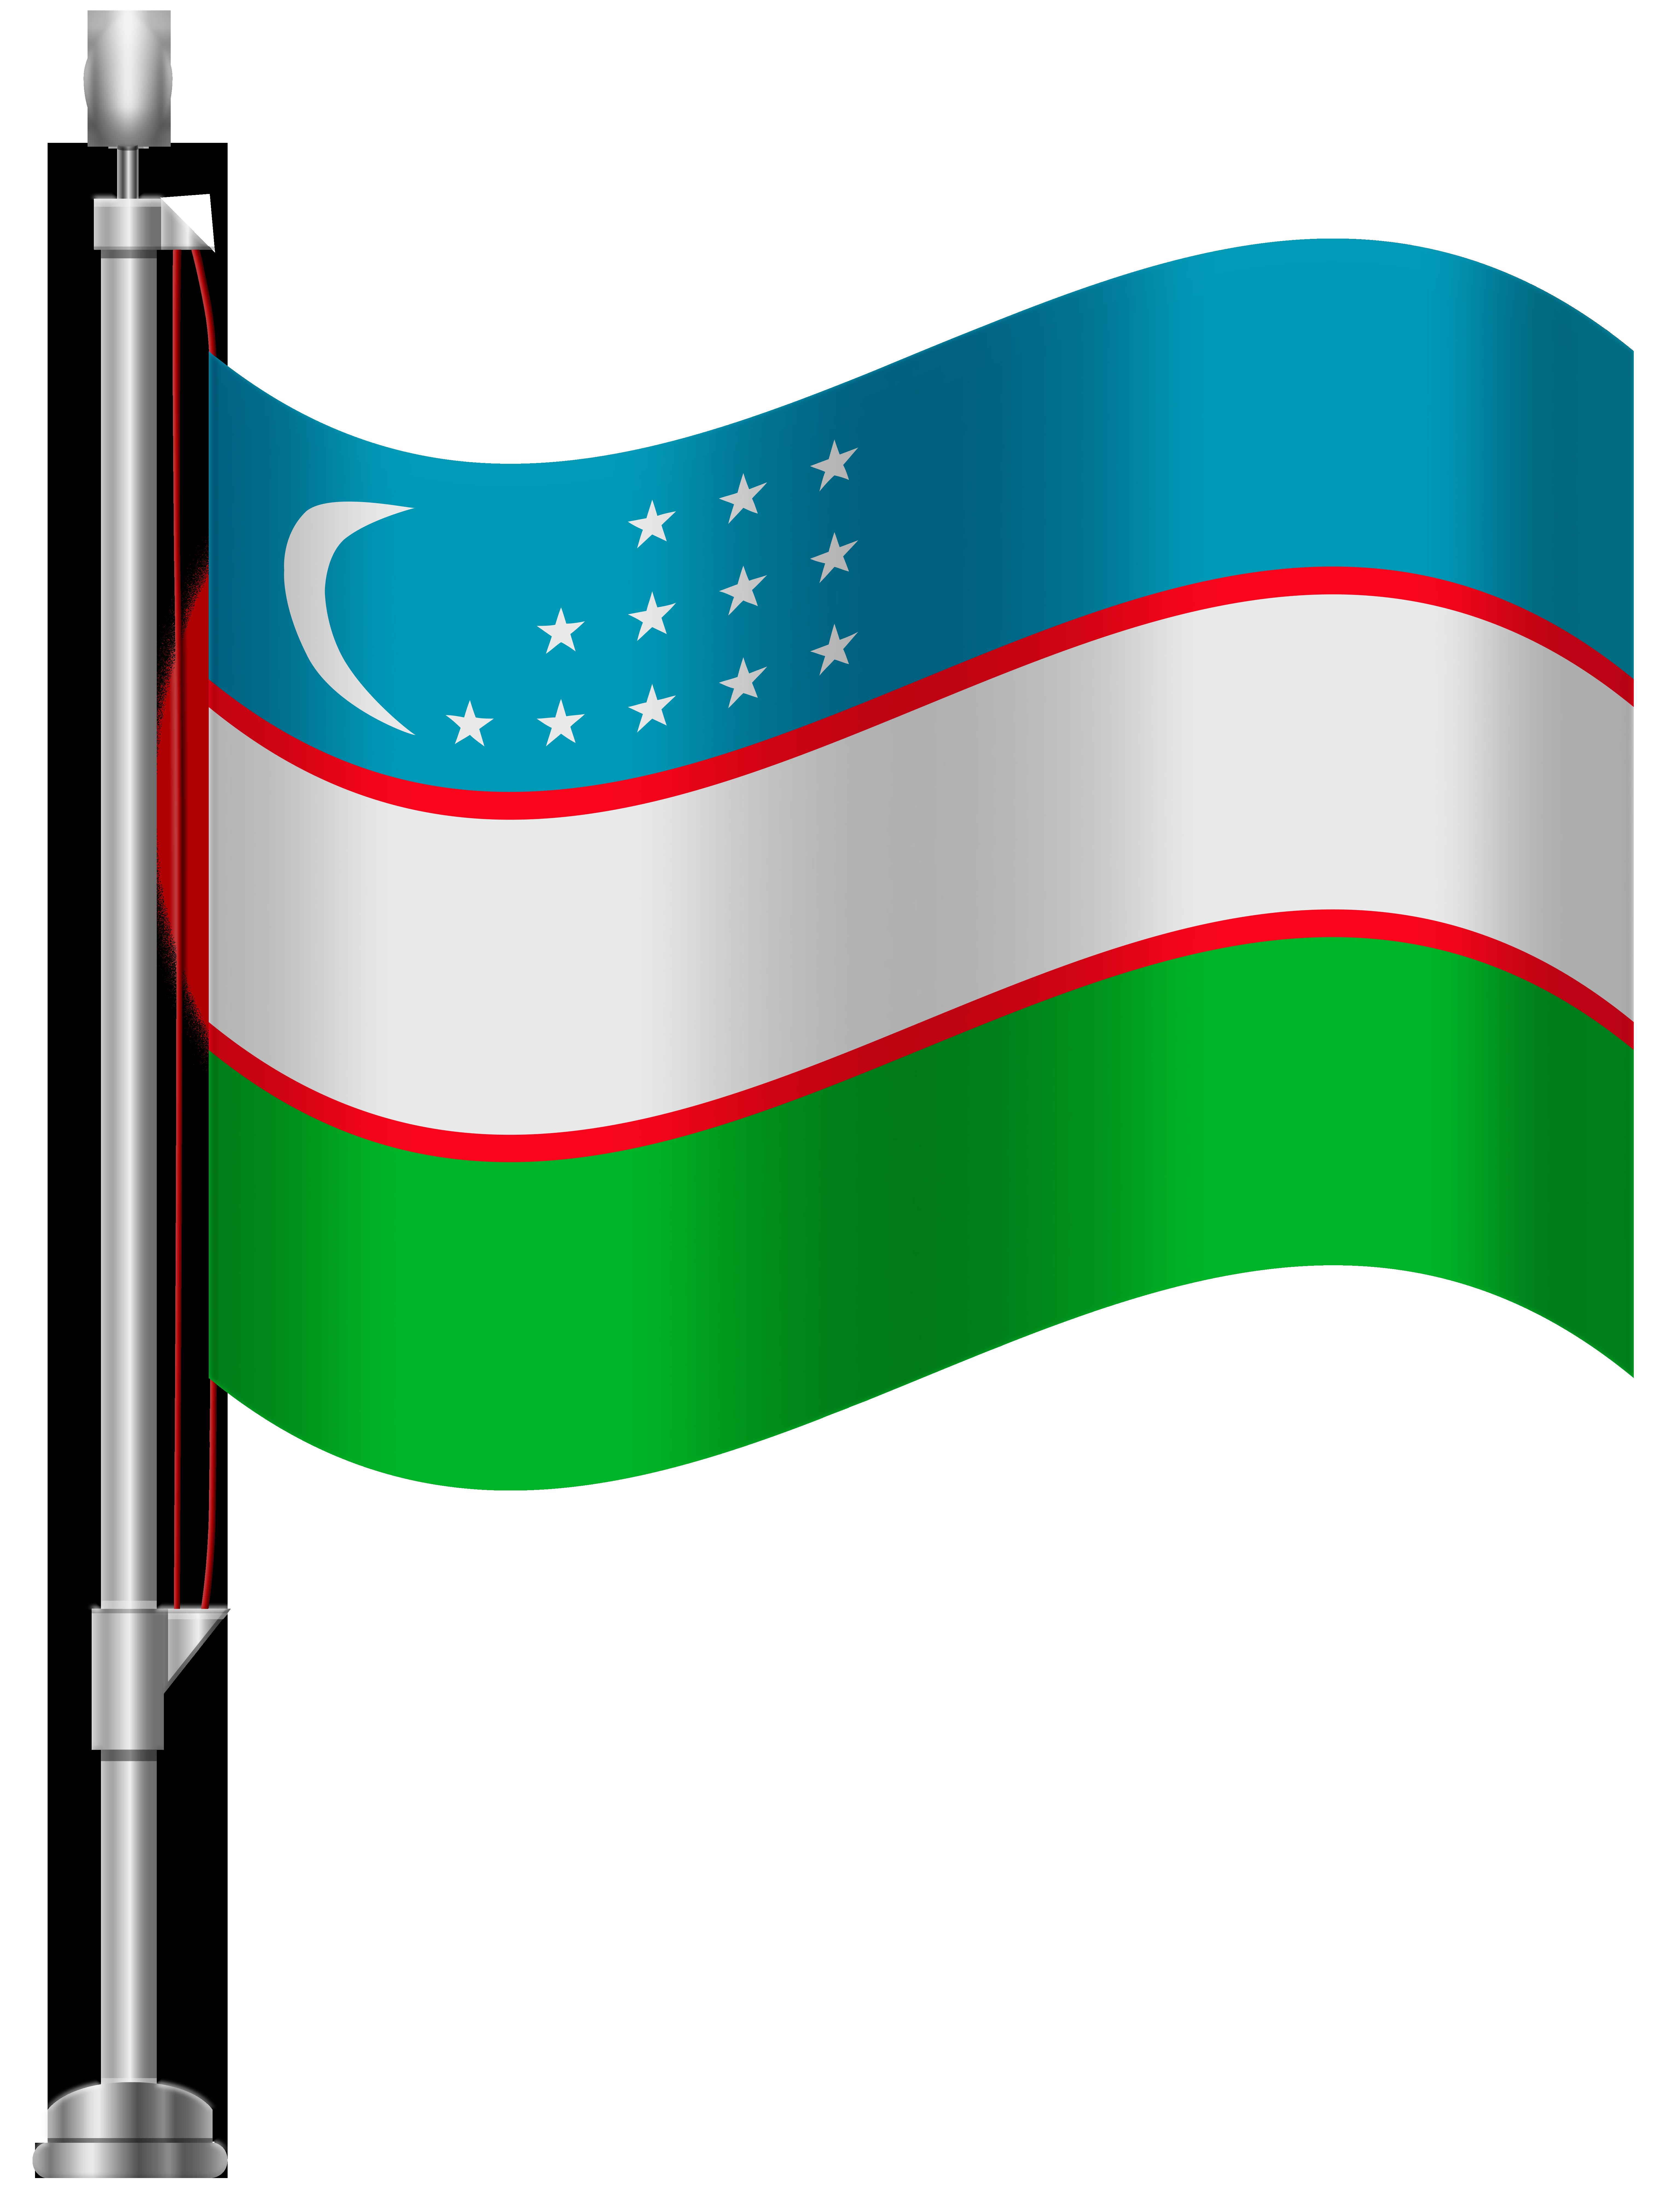 Flag of uzbekistan clipart. Png clip art best